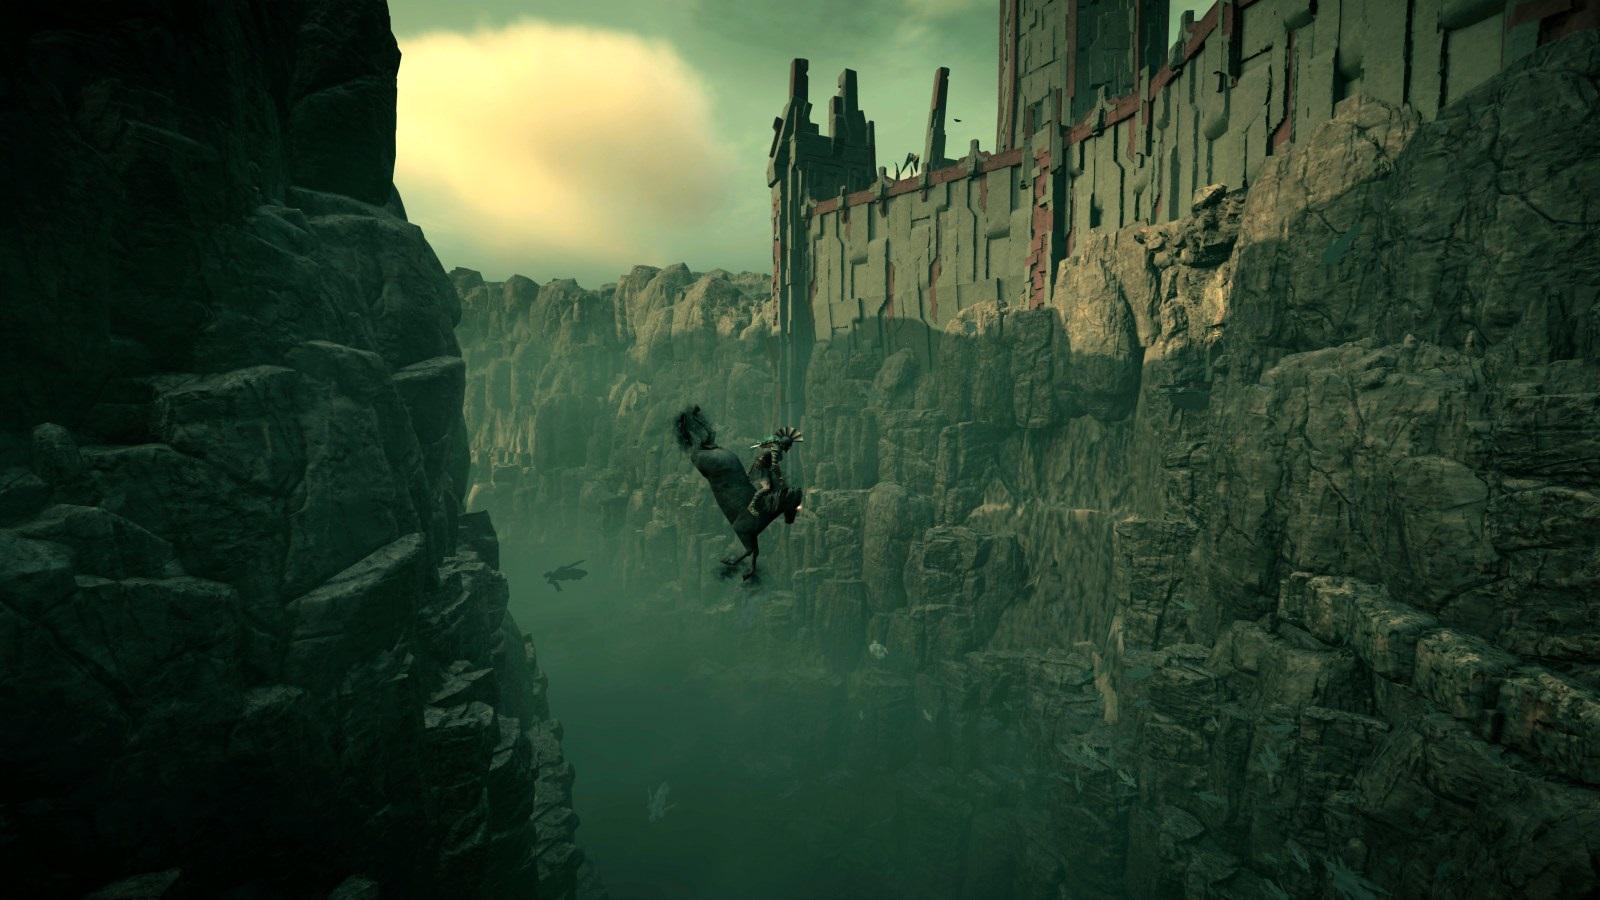 Assassin's Creed Odyssey: Fate of Atlantis (RECENZE)   Alza cz